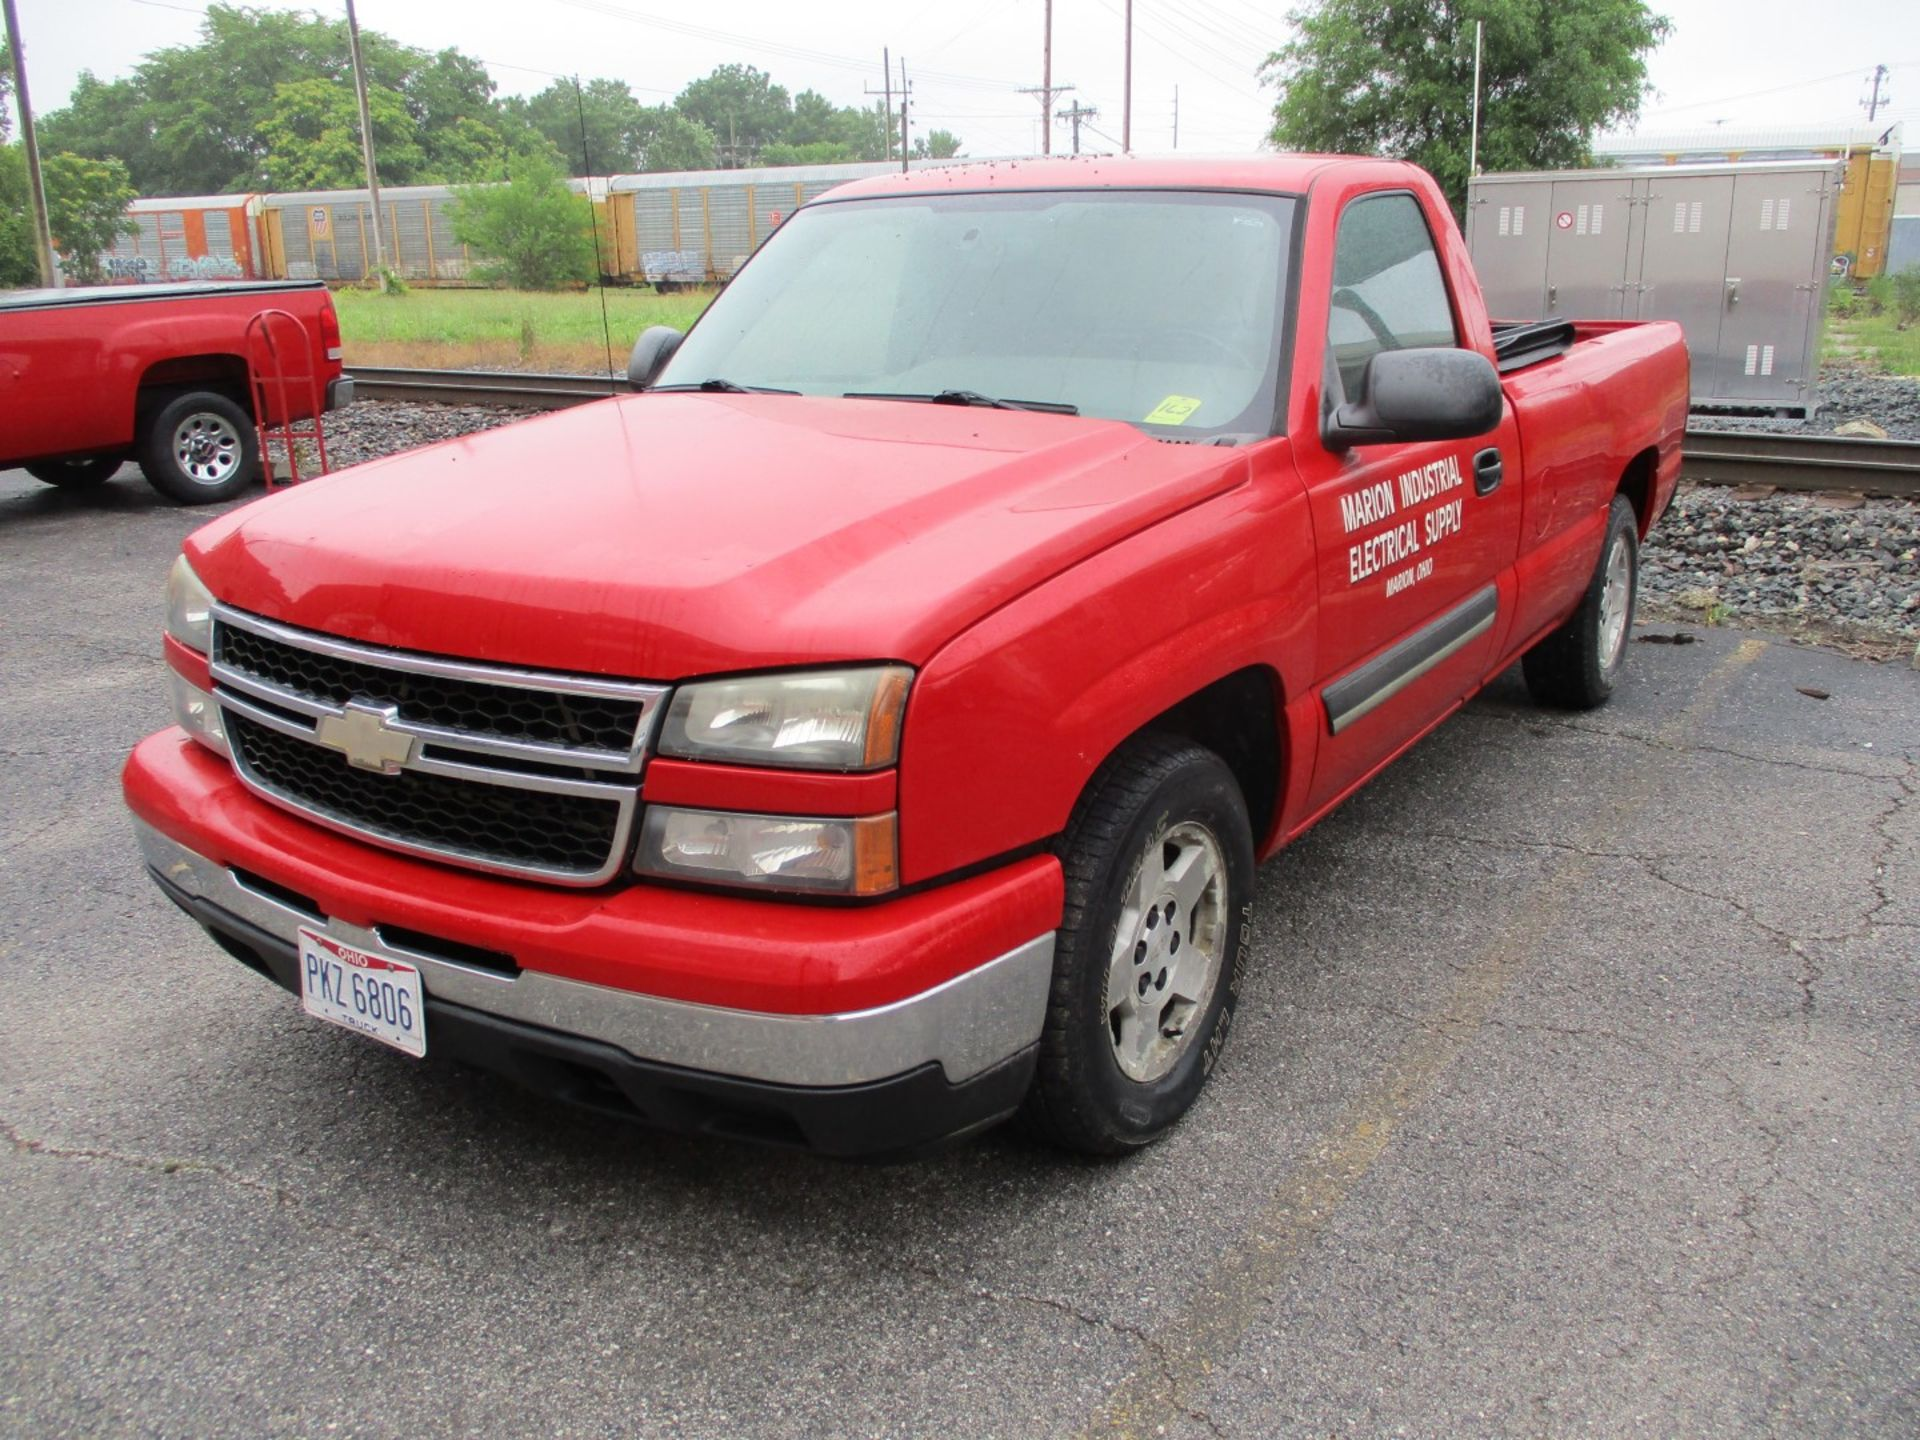 2006 Chevrolet Silverado 1500 LT Pickup, VIN 1GCEC14V96E251510, Regular Cab, Automatic, AC, 8' - Image 2 of 21